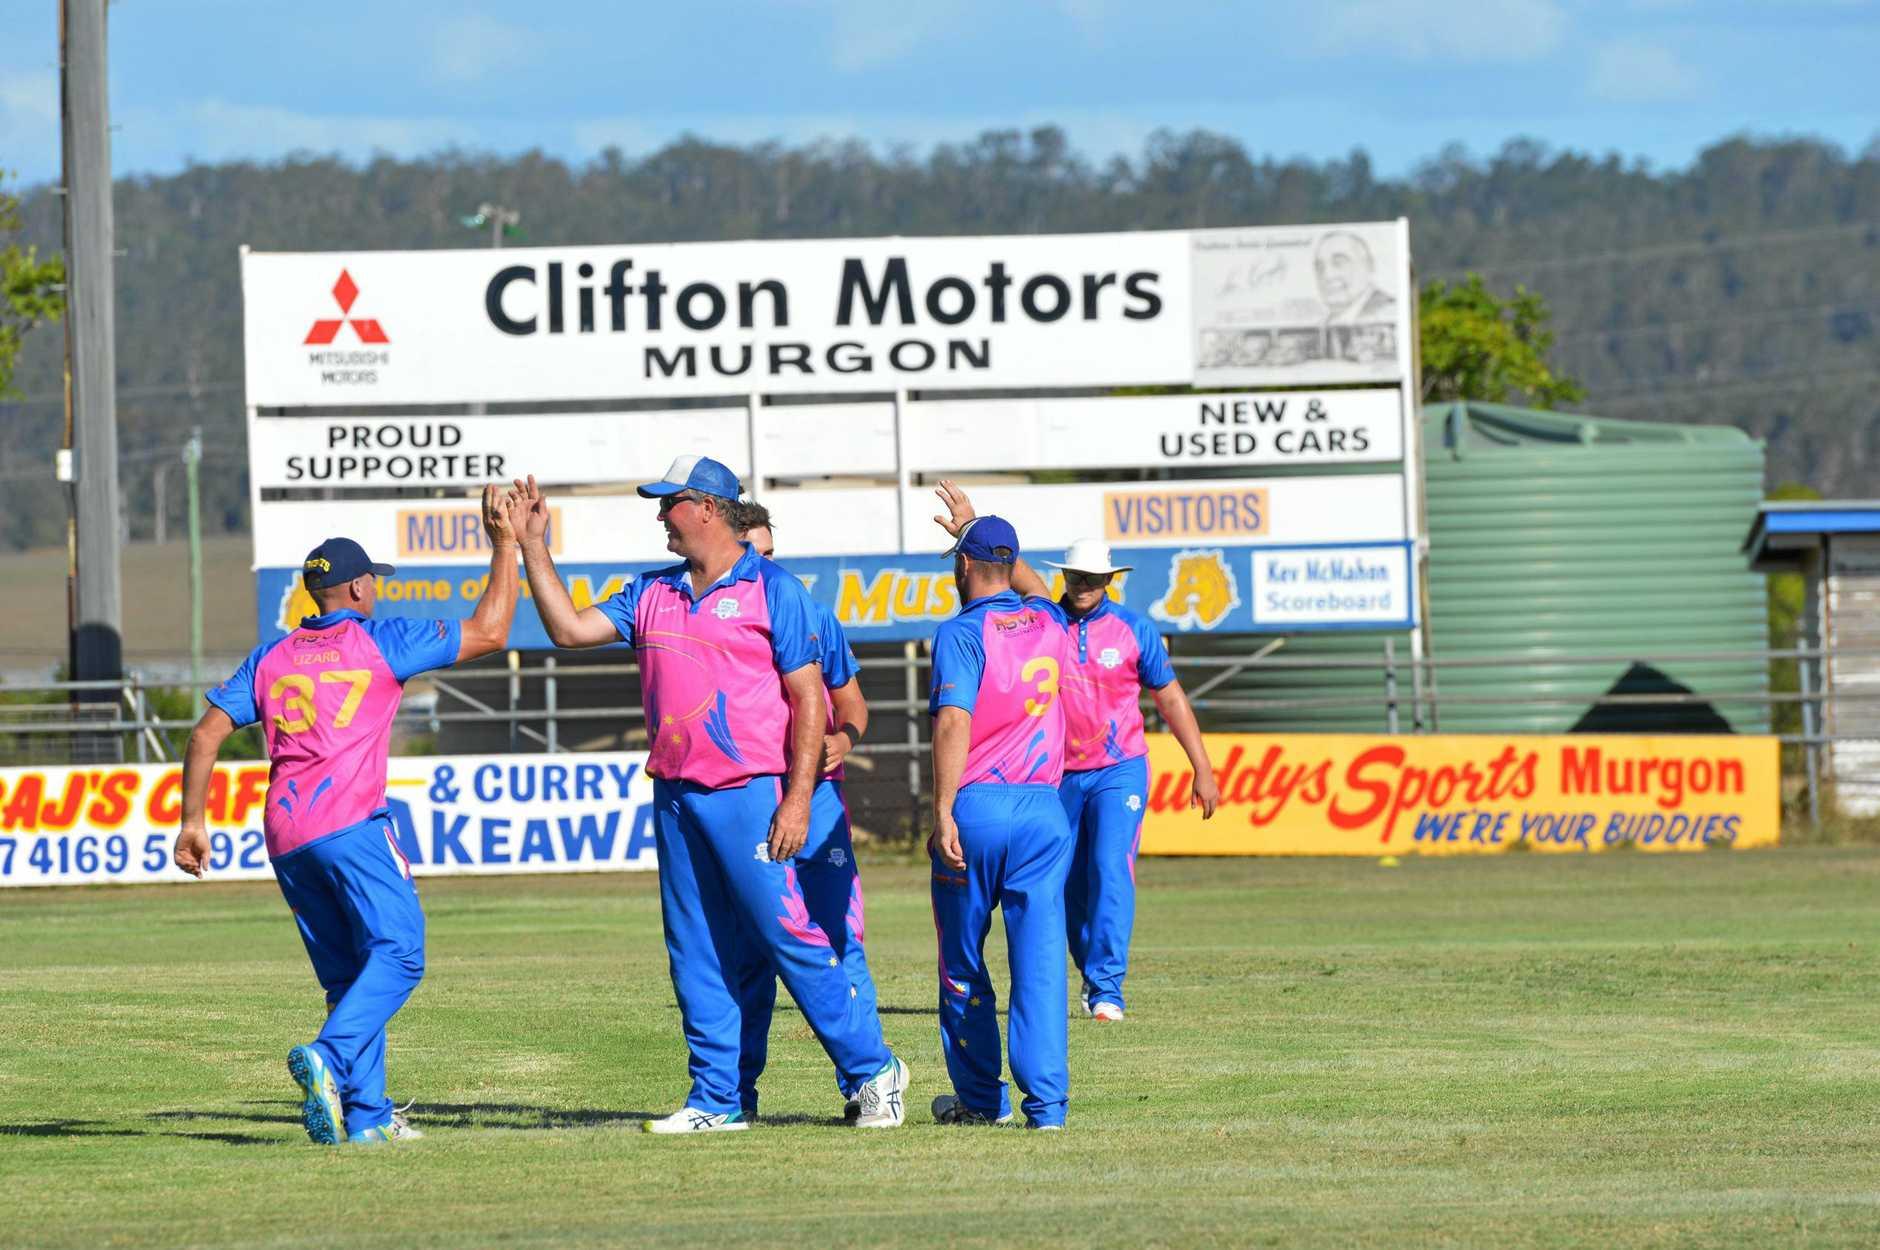 WINNING WAY: The Murgon Crusaders celebrate a wicket.